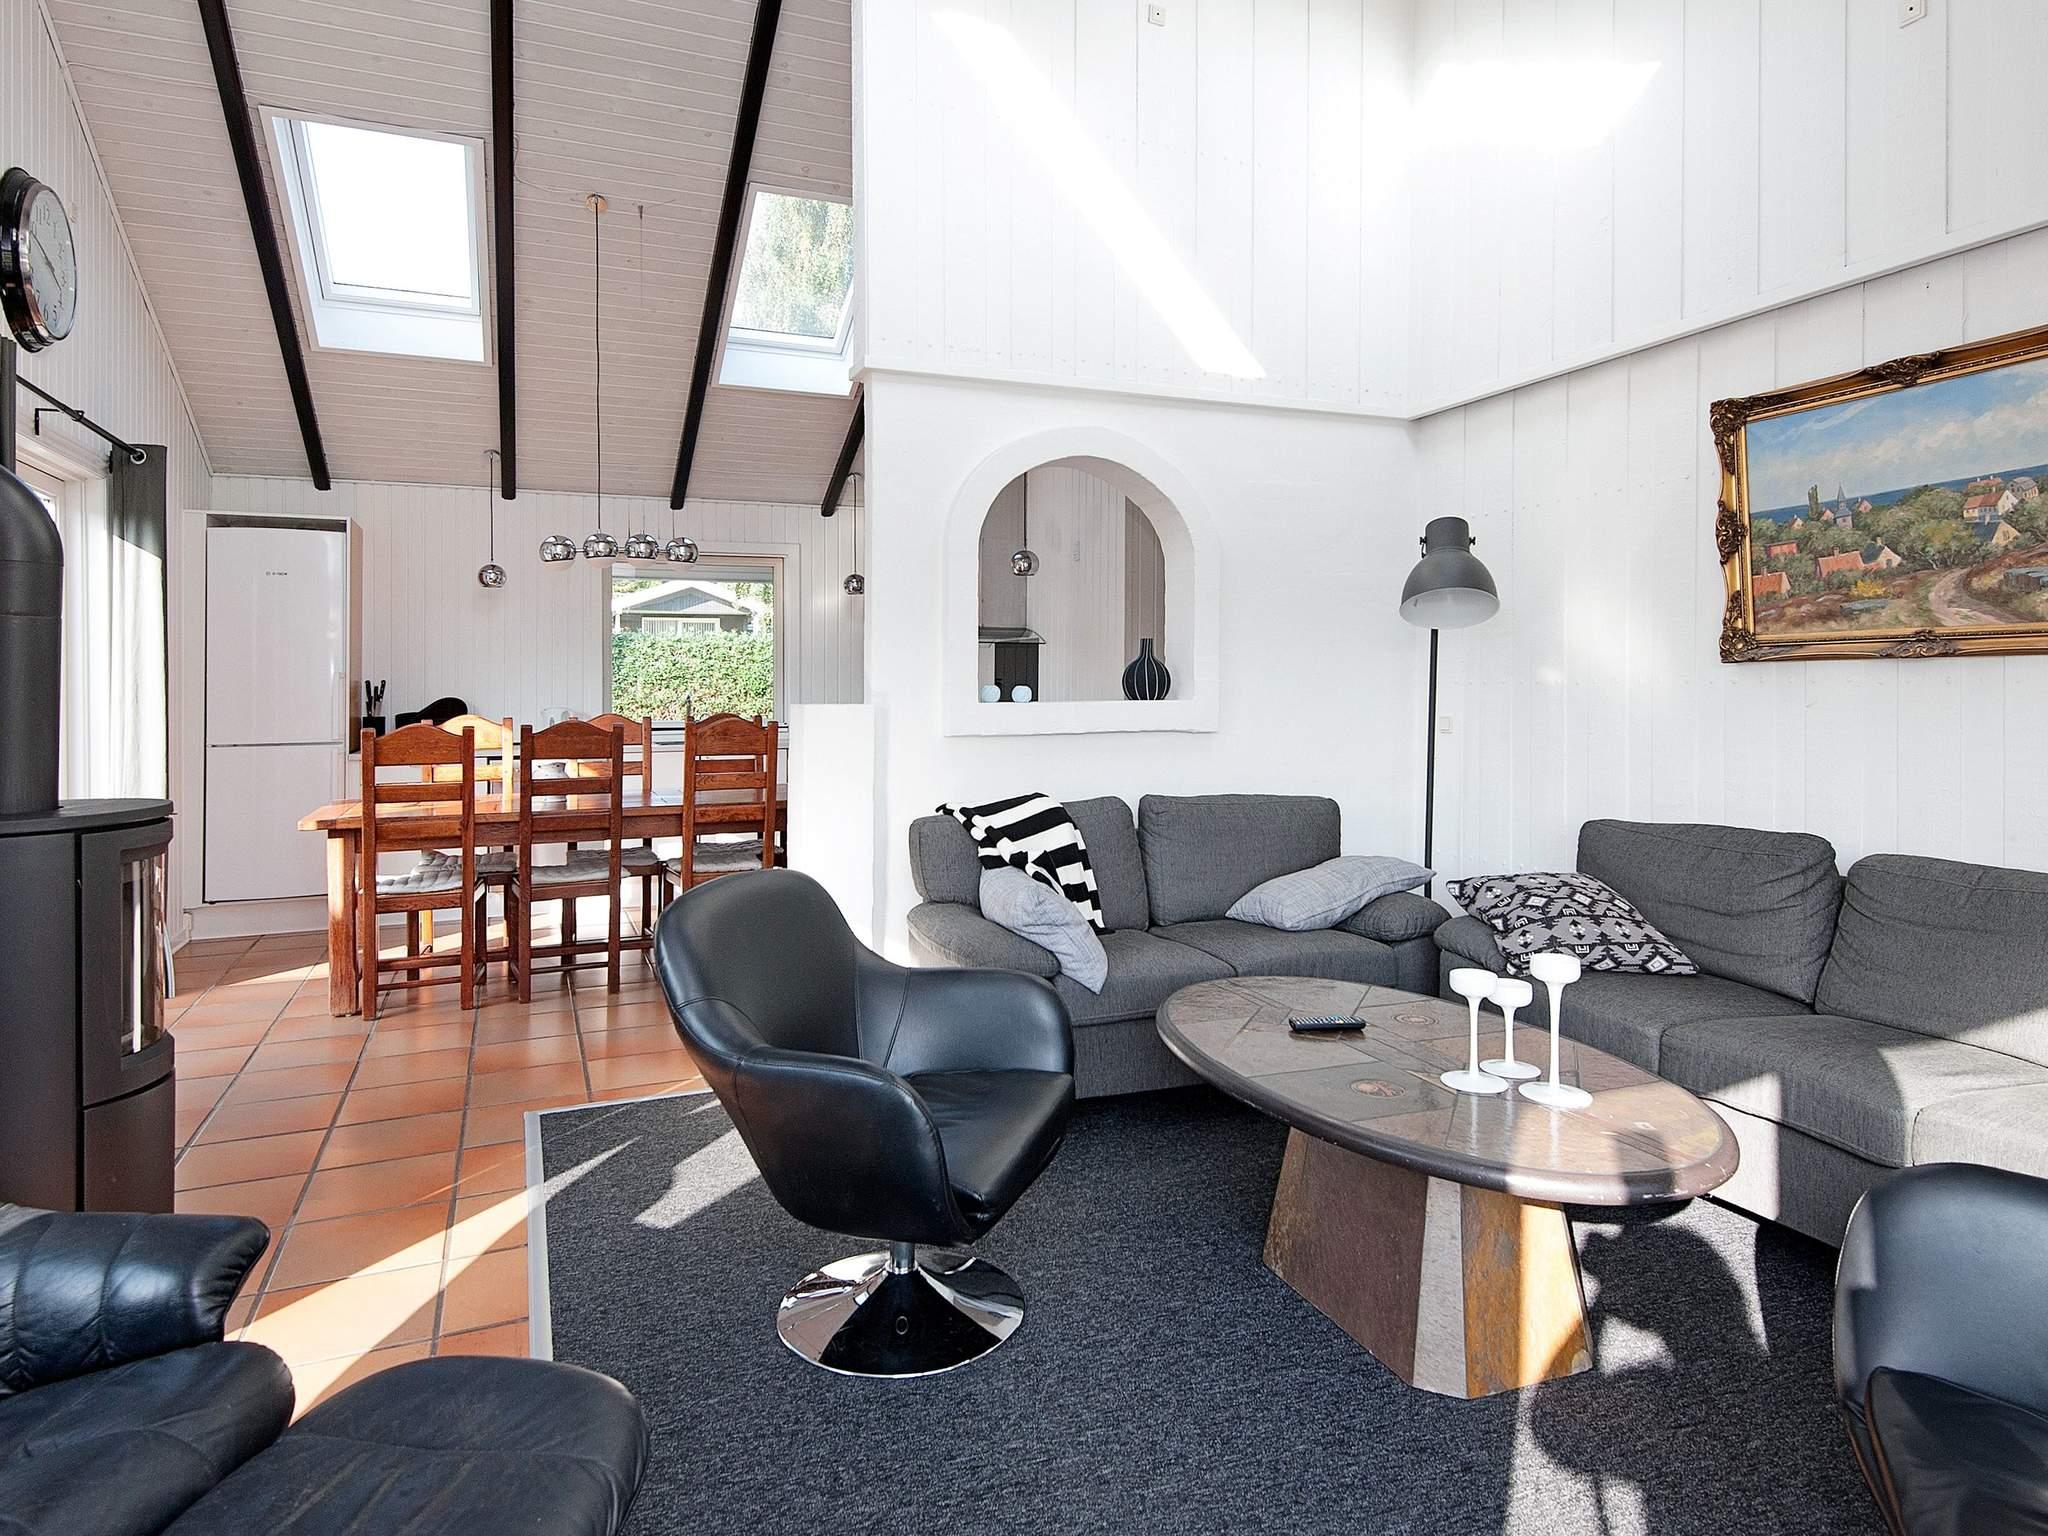 Ferienhaus Hejlsminde Strand (85685), Hejls, , Südostjütland, Dänemark, Bild 6